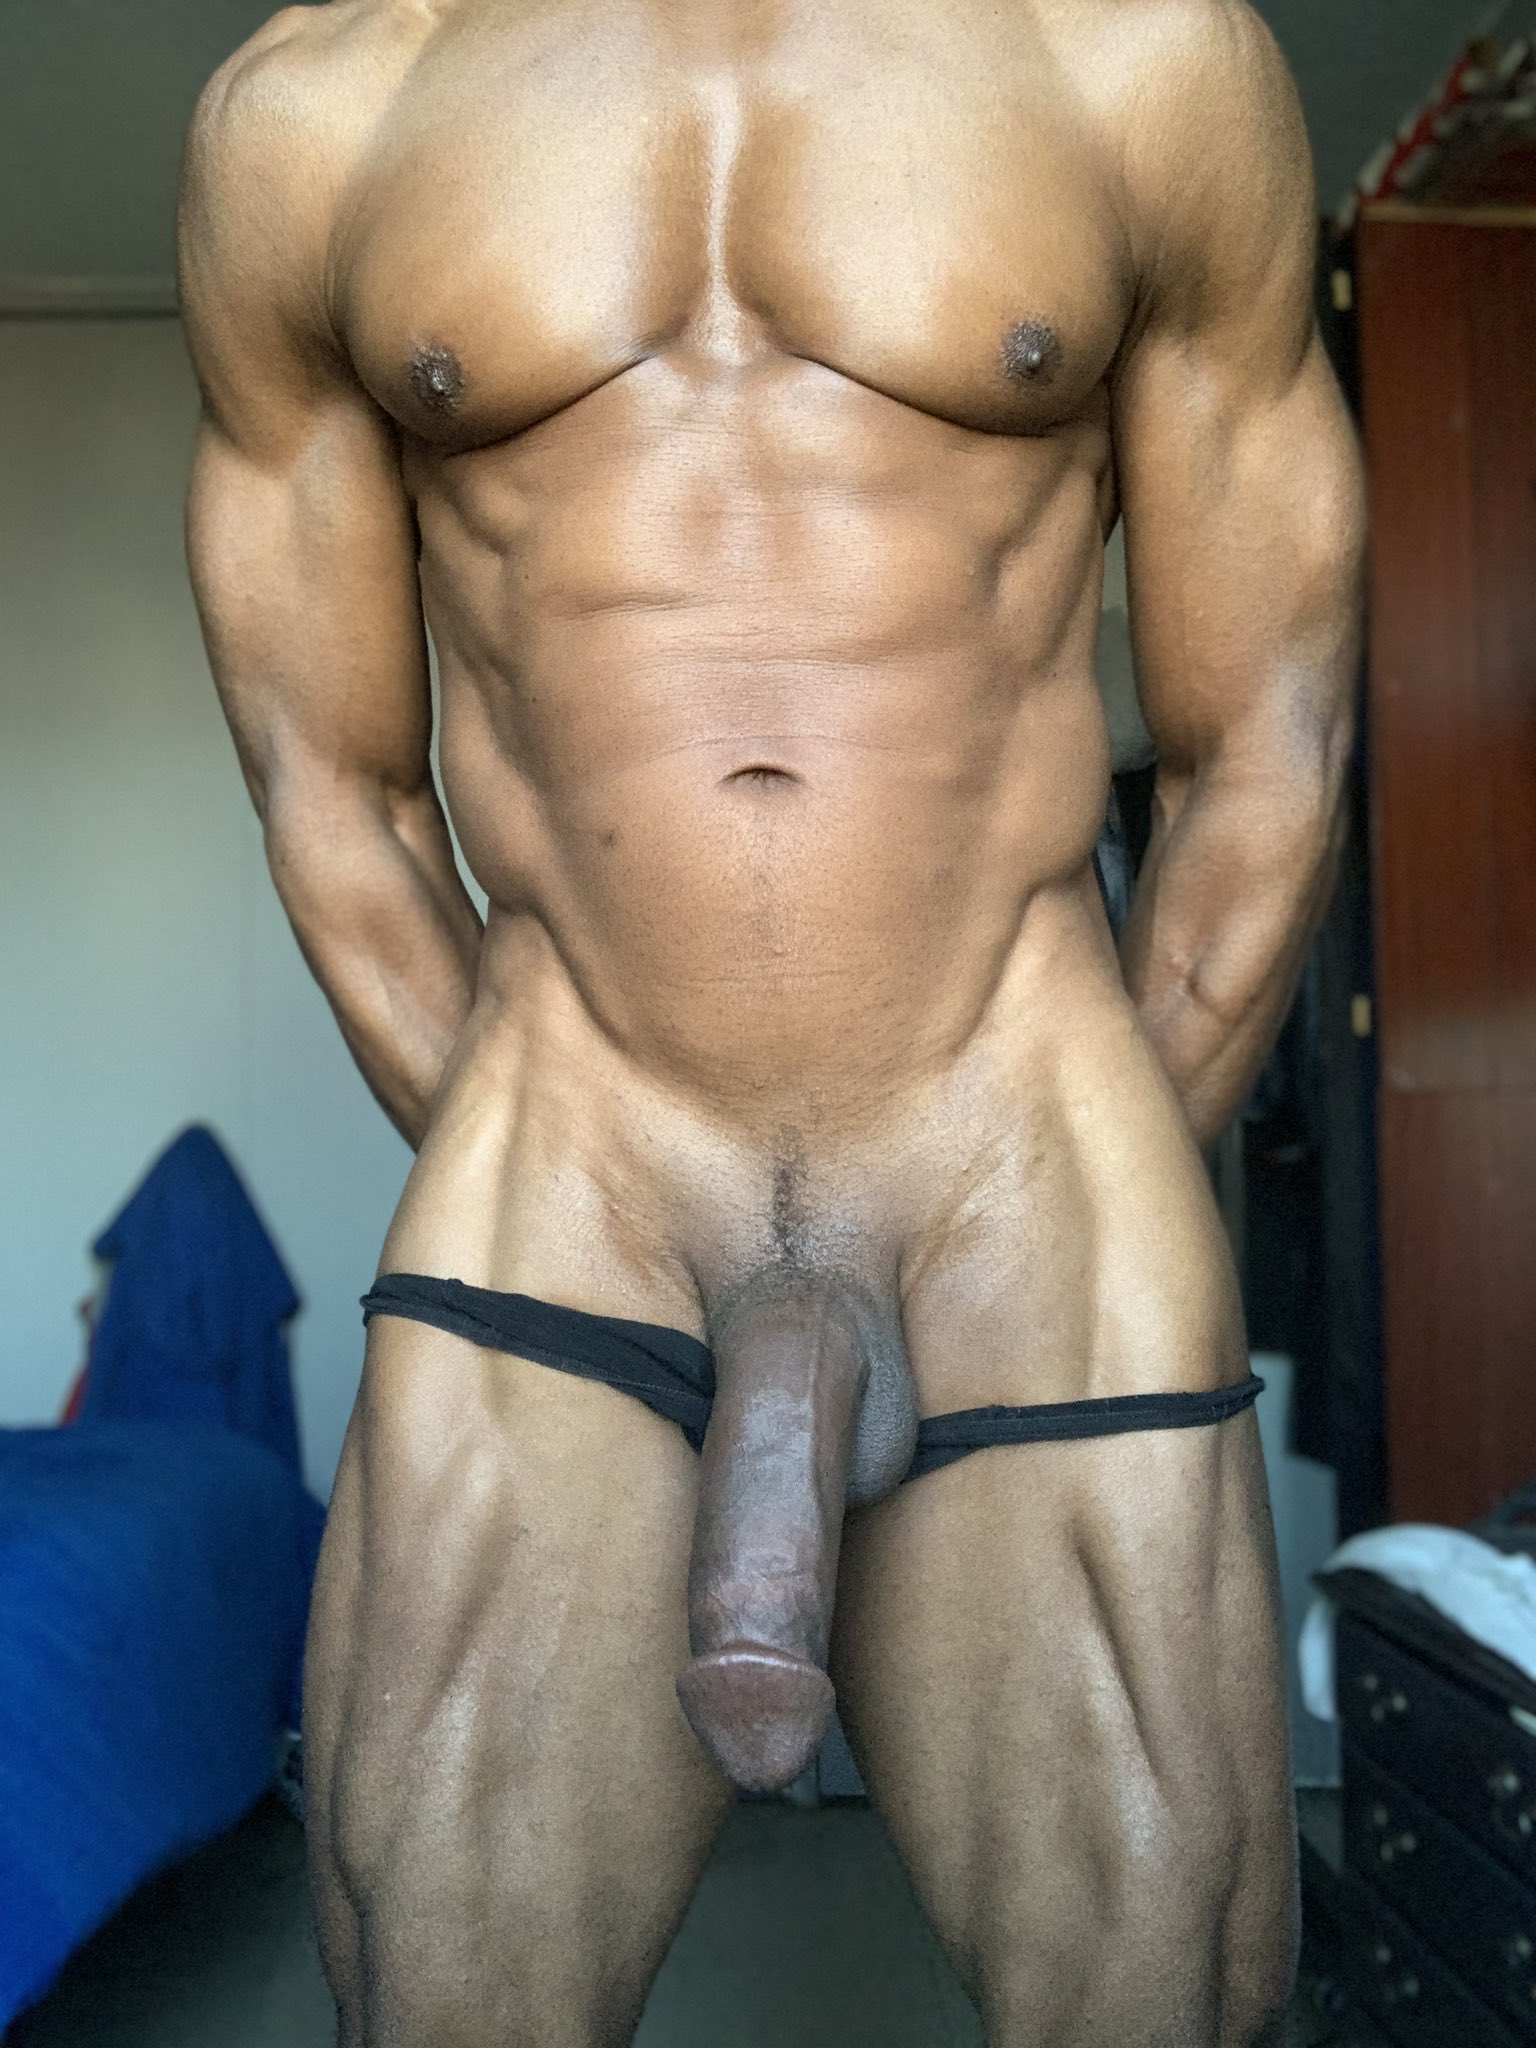 negro desnudo